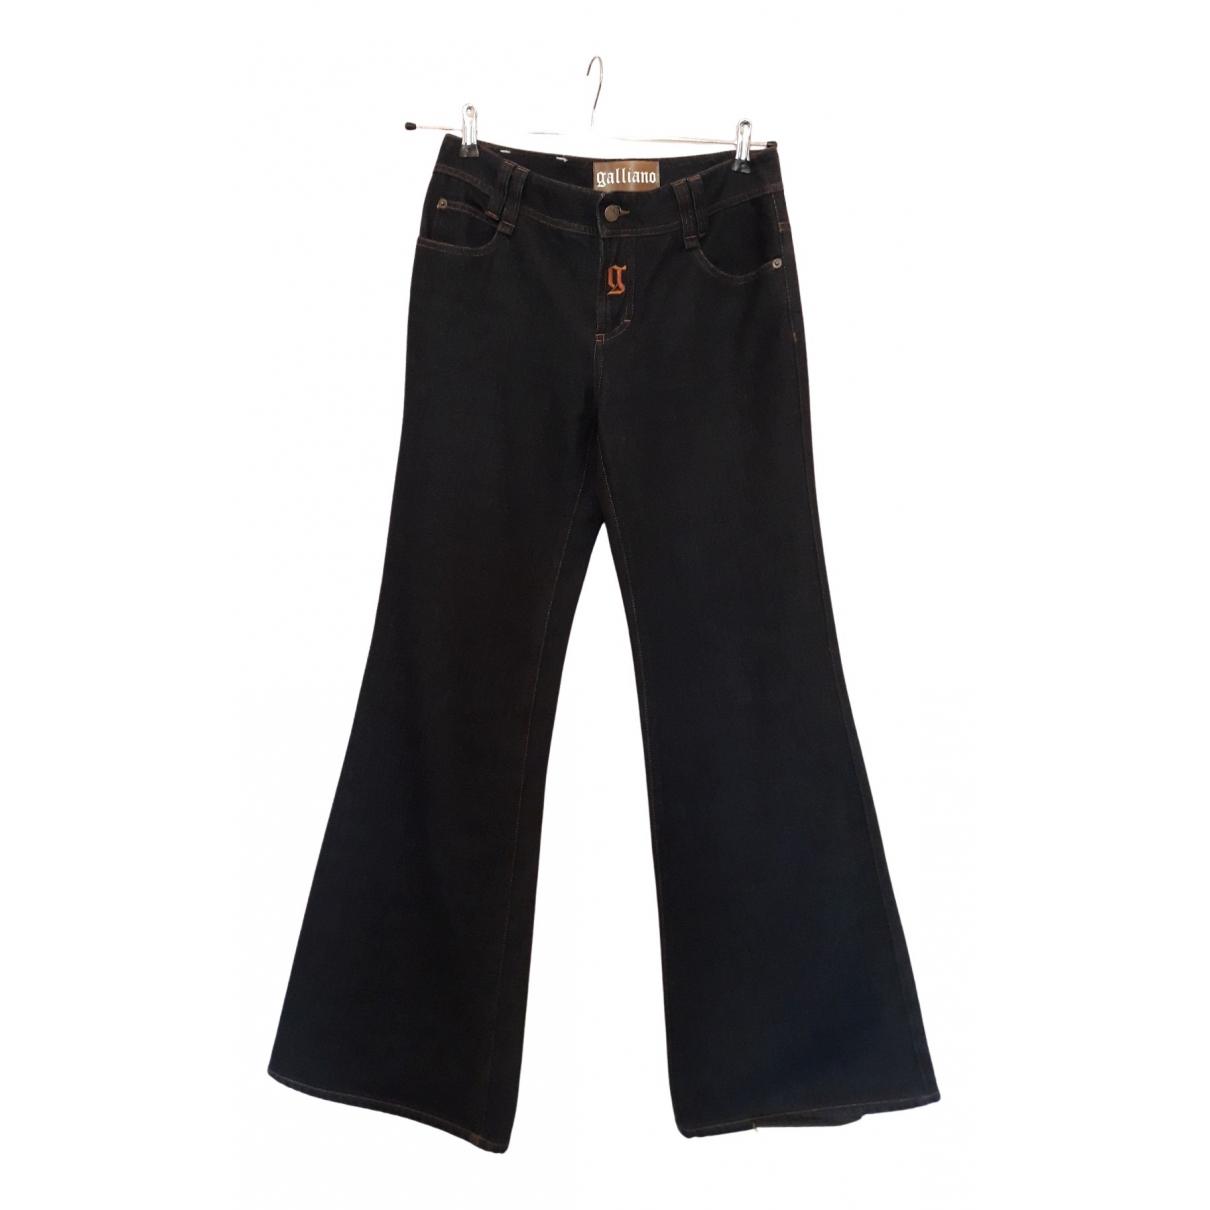 Galliano N Blue Denim - Jeans Trousers for Women 38 FR